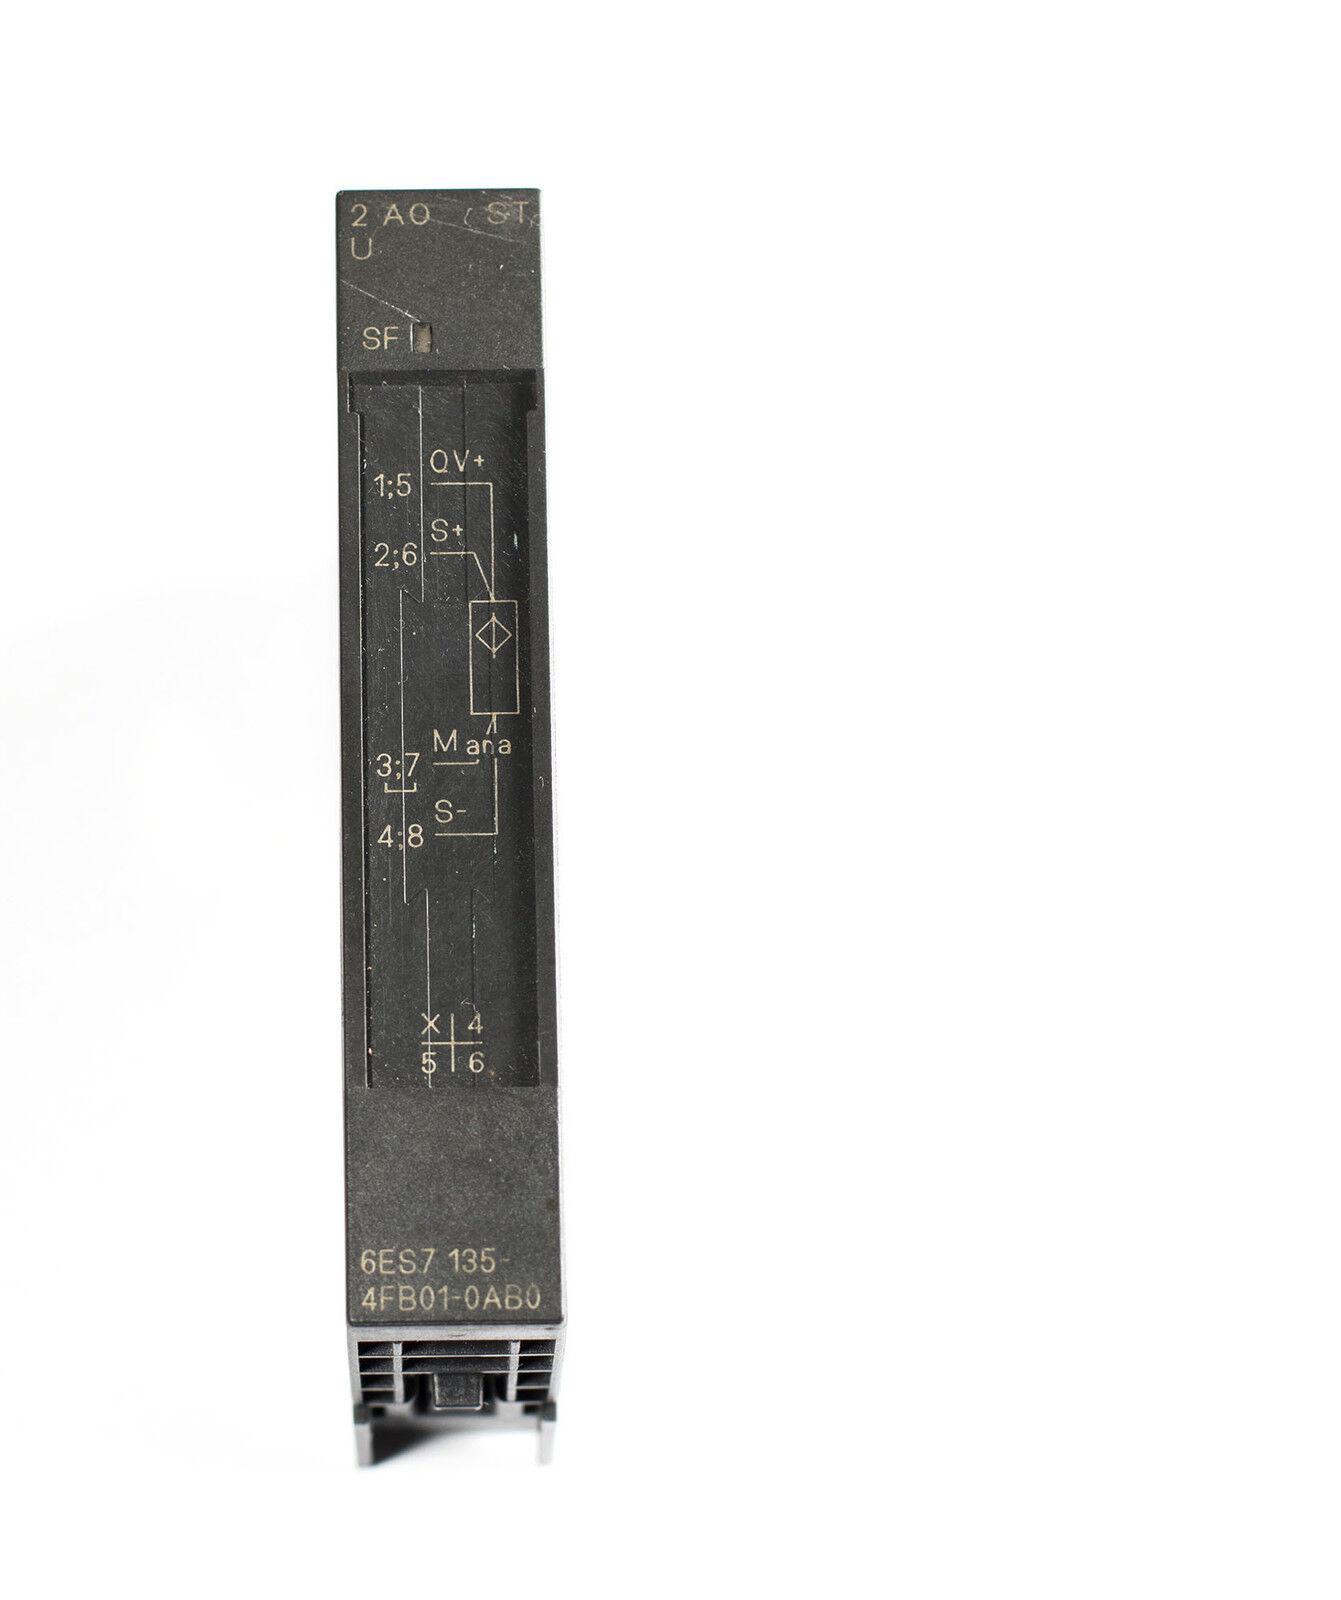 NEW Siemens Simatic ET200S 2 AO U //-10V 6ES7 135-4FB01-0AB0 6ES71354FB010AB0